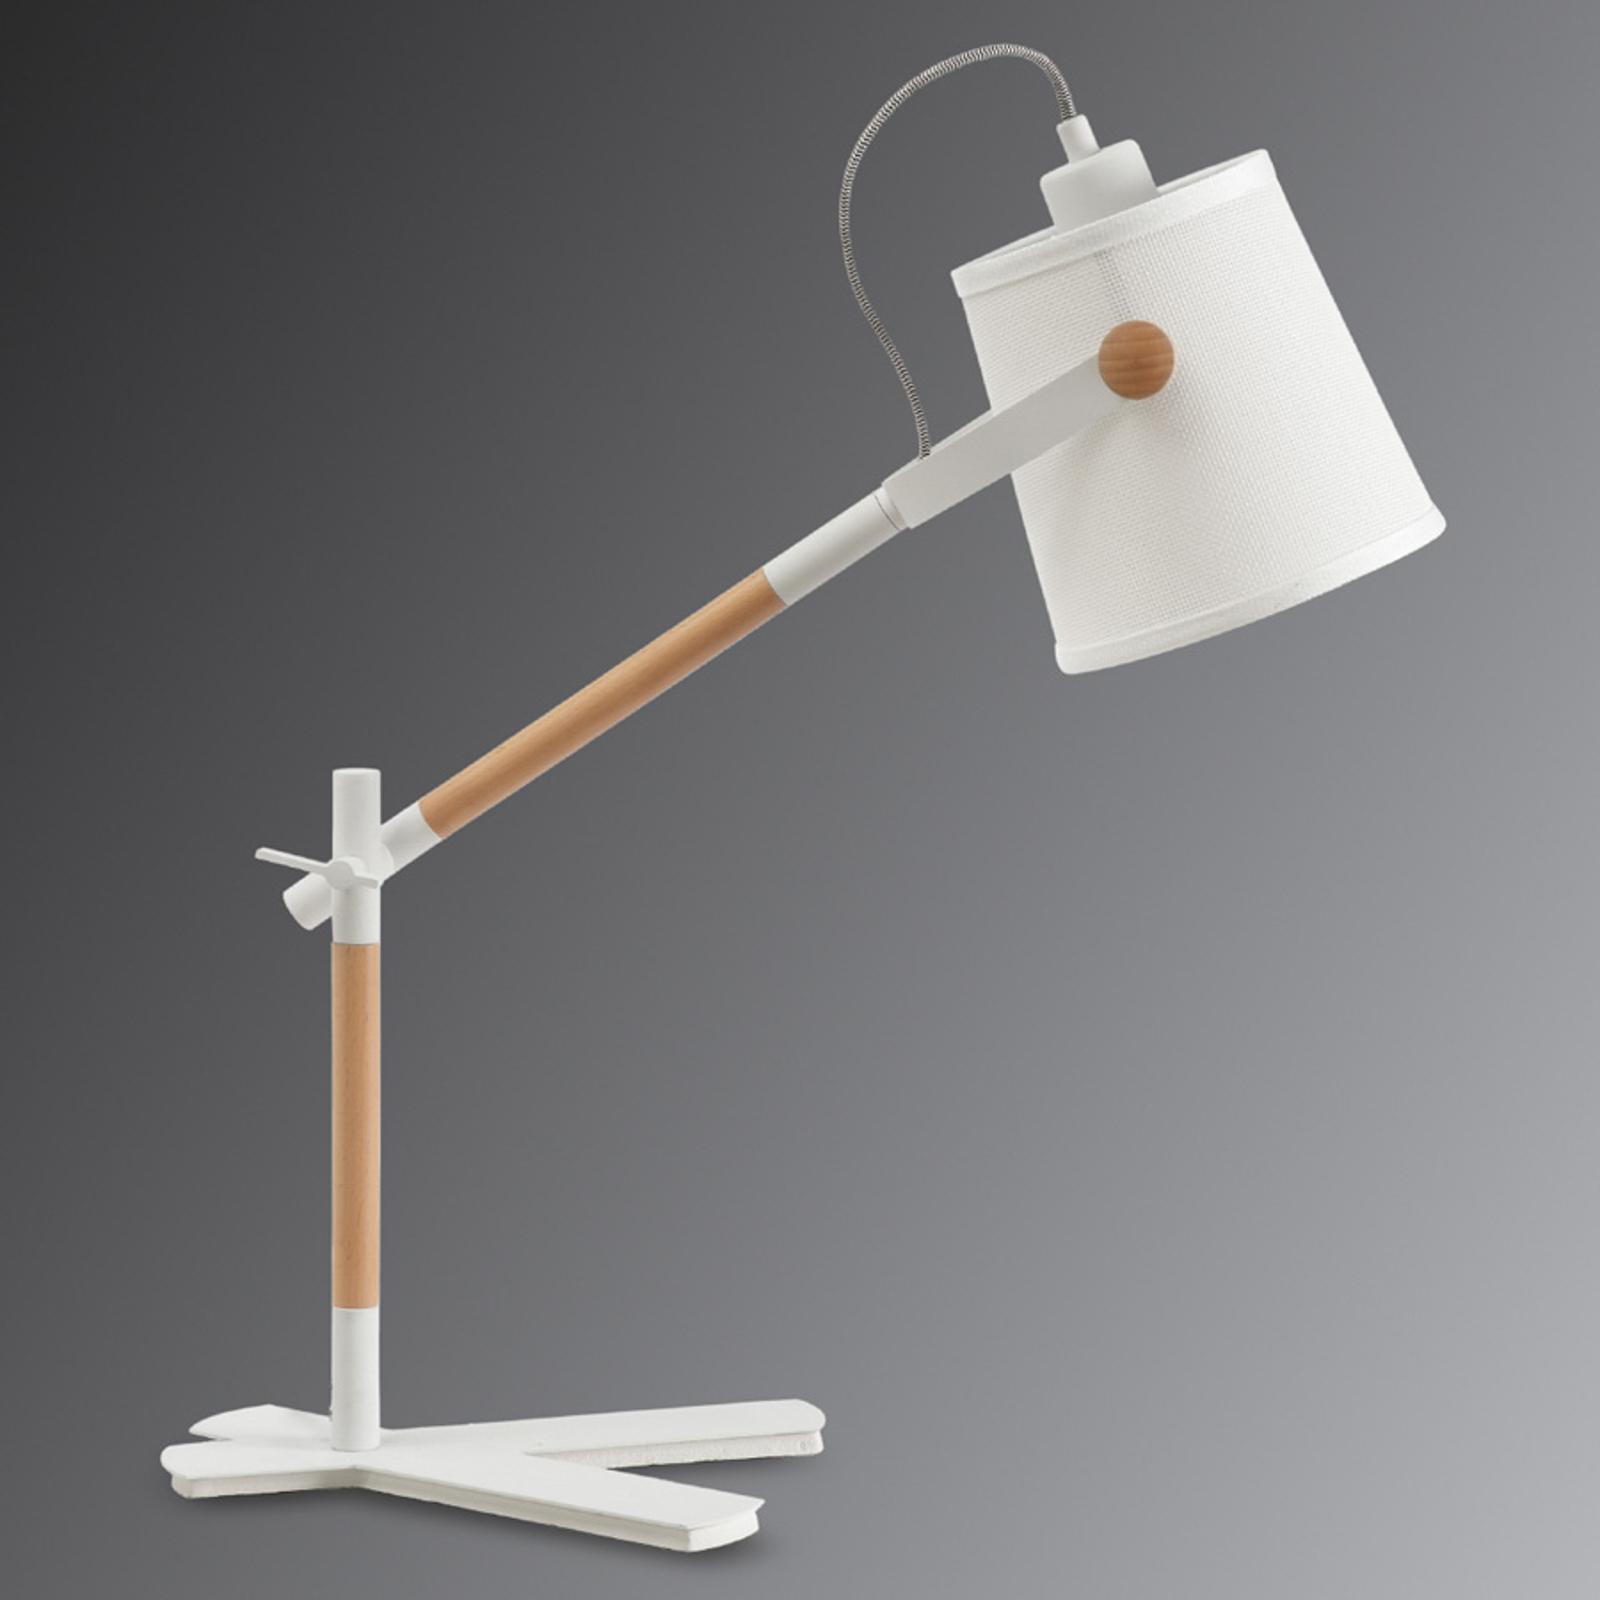 Tafellamp Nordica m. stoffen kap